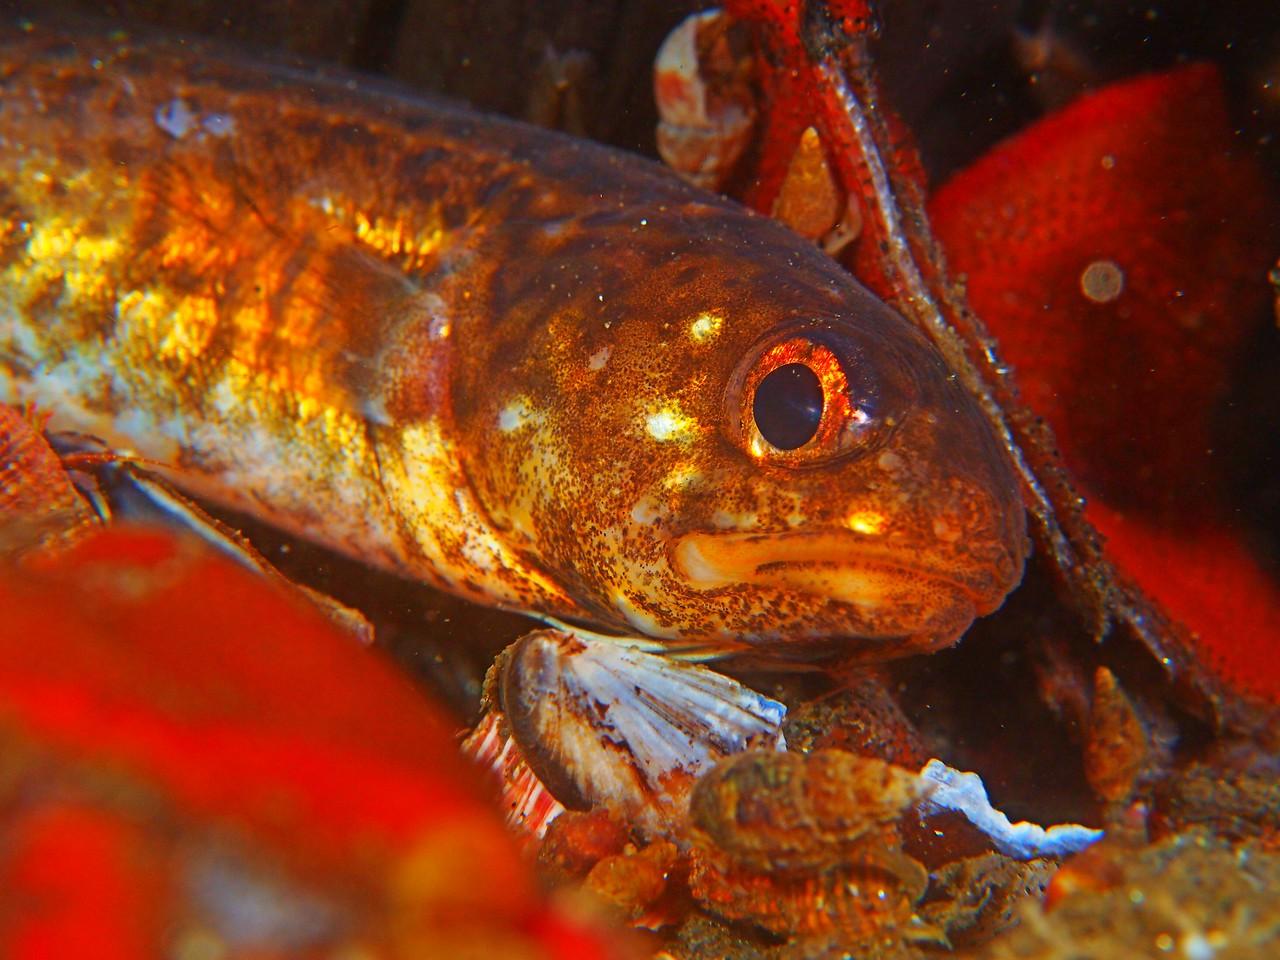 Chilara taylori (spotted cusk eel)